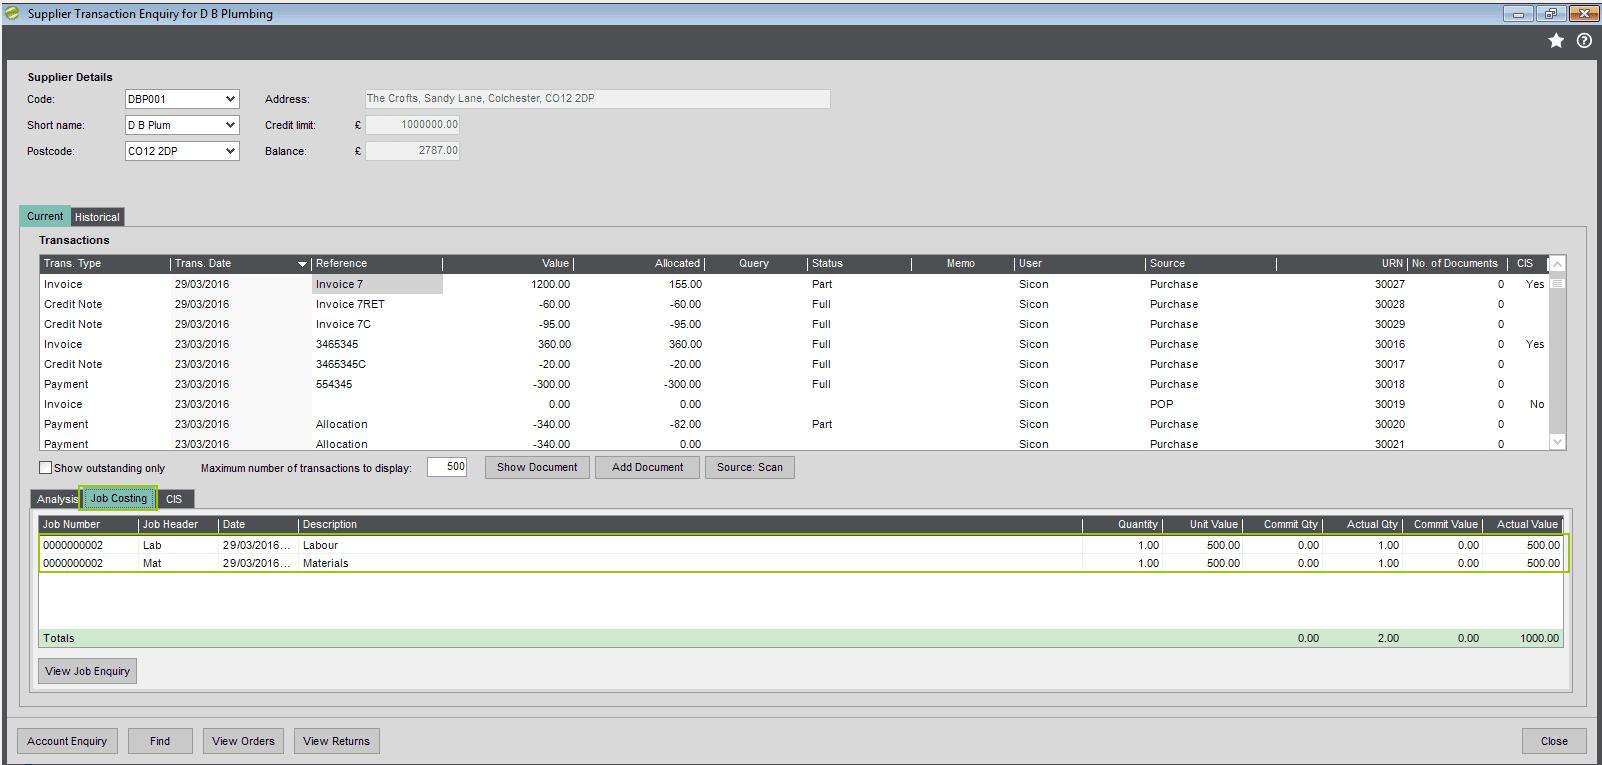 CIS Supplier Transaction